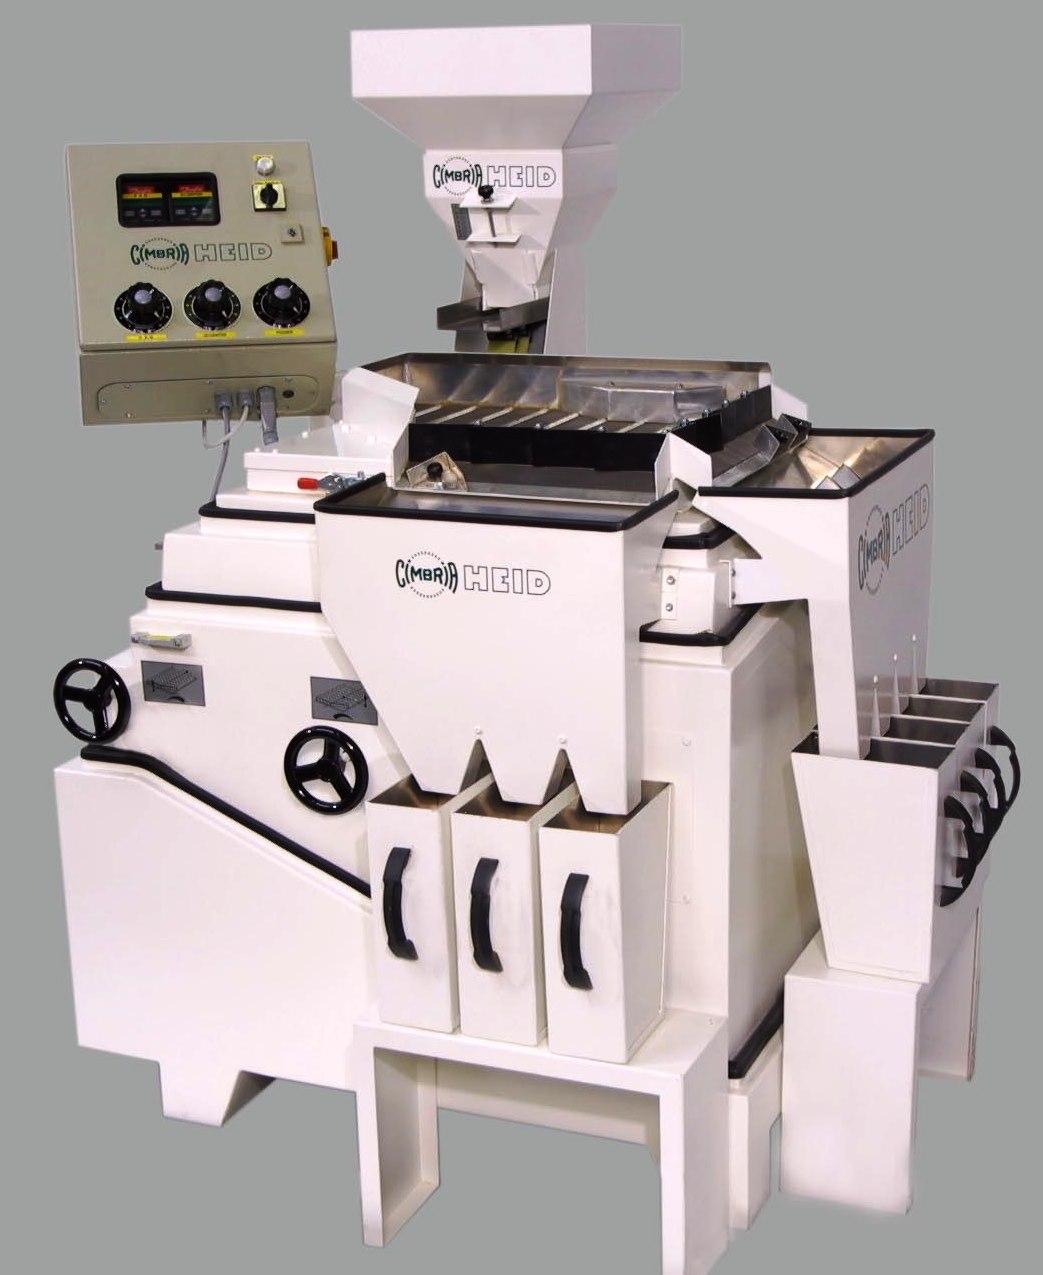 laboratorny-pneumaticky-stol-ga-lab